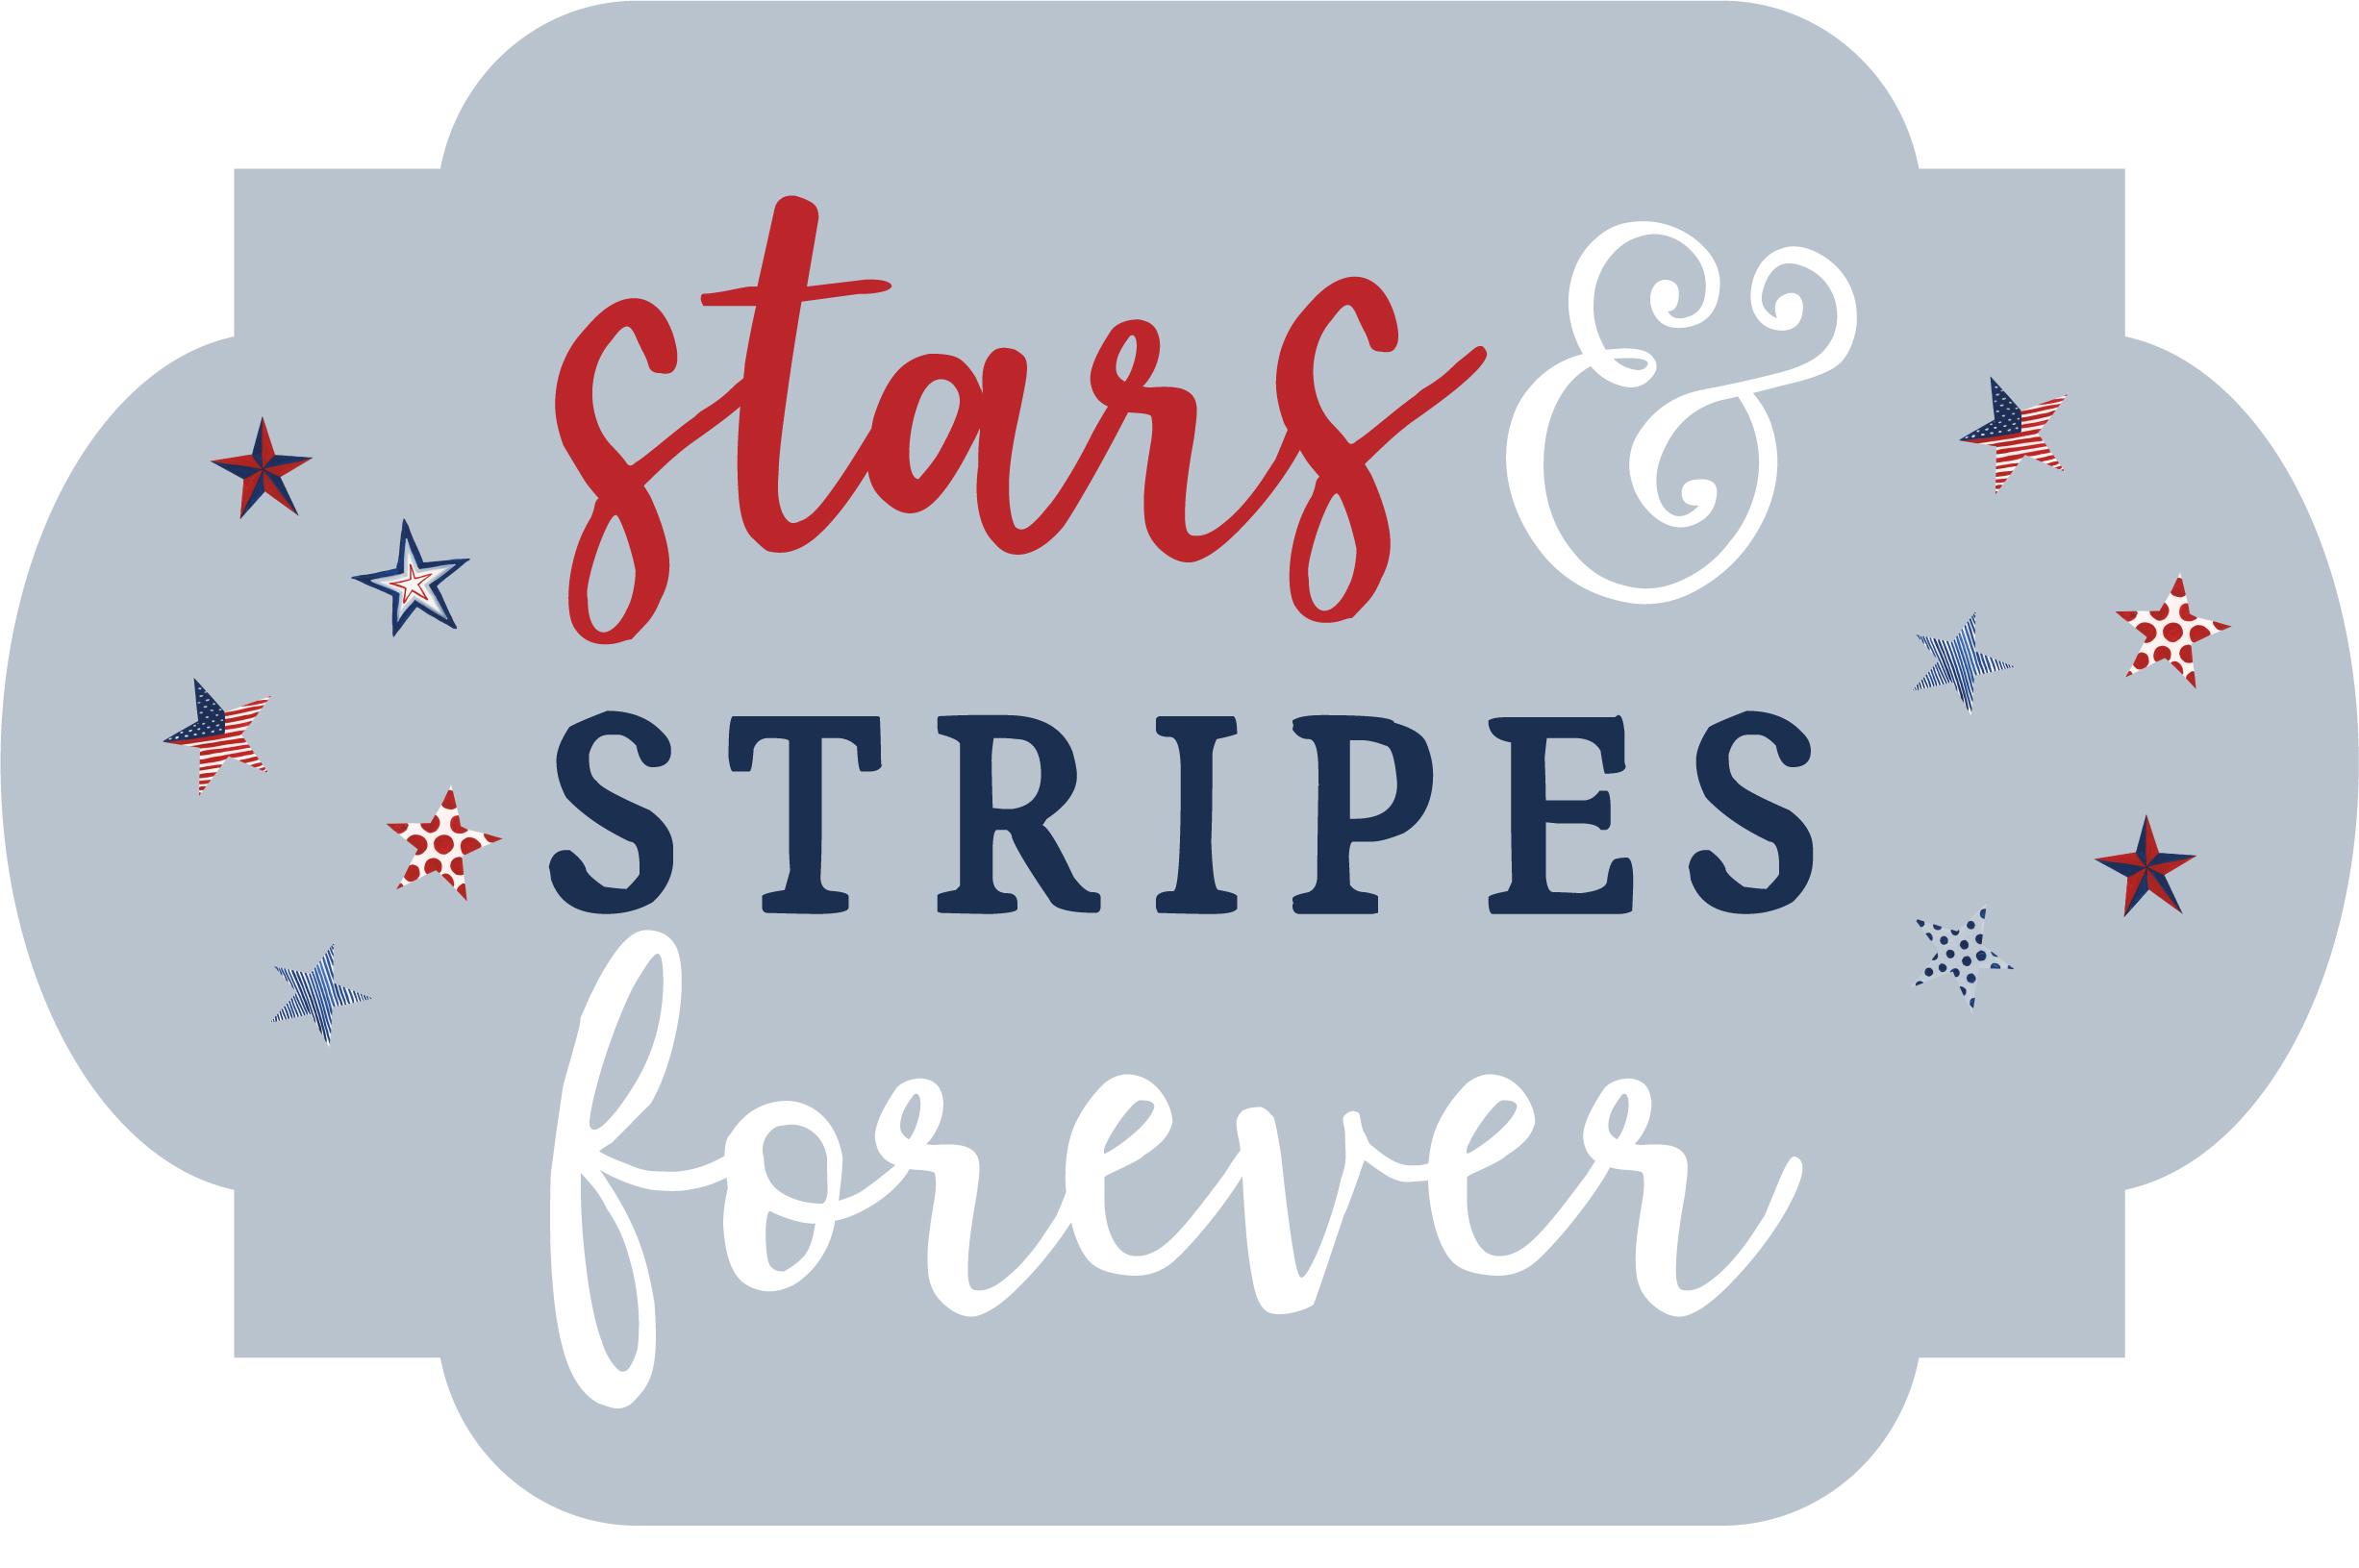 Stars & Stripes Forever Print & Cut File